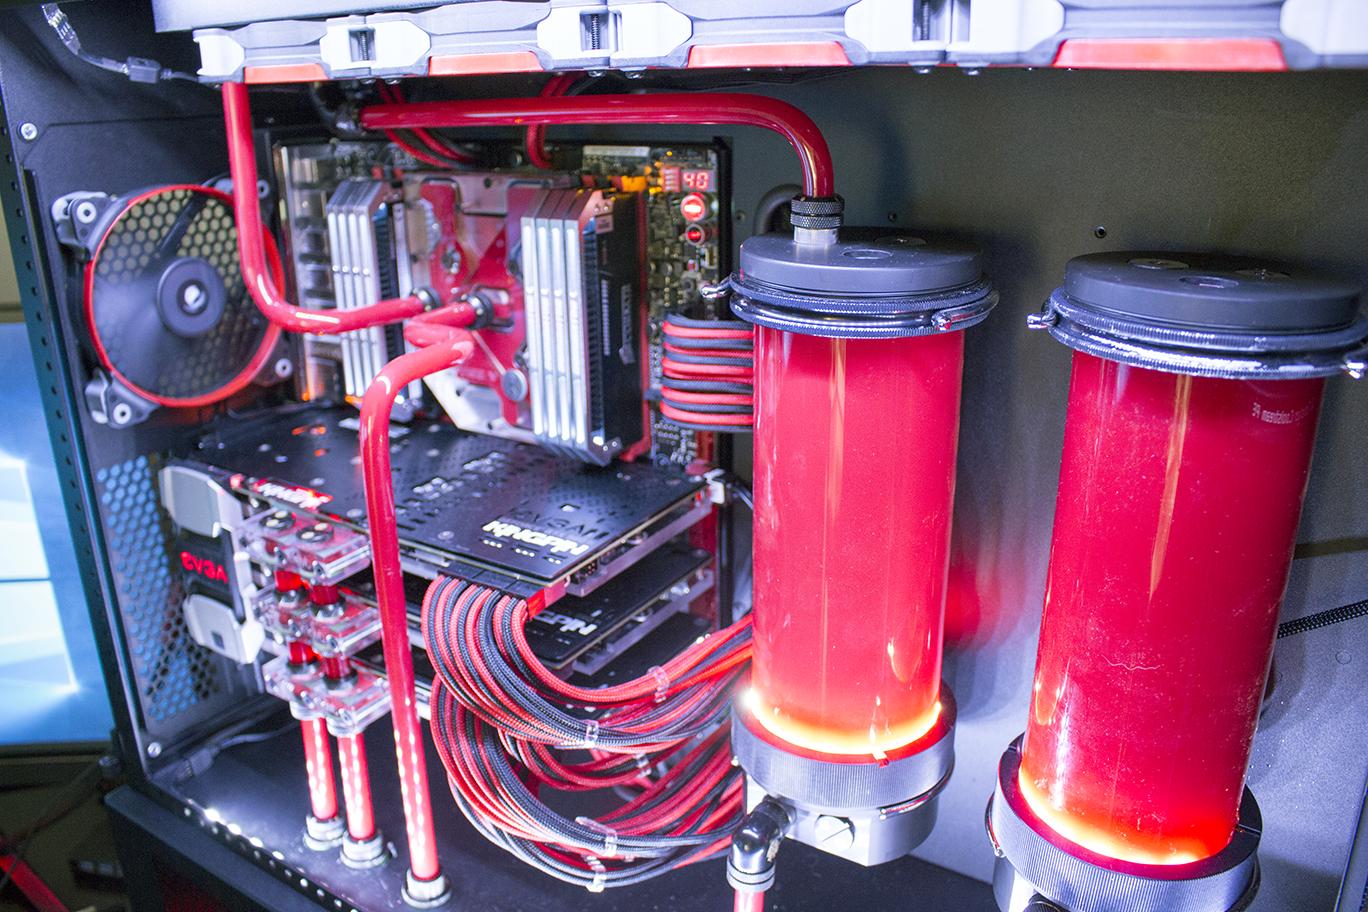 Sma8 M Custom Computer Computer Build Computer Case